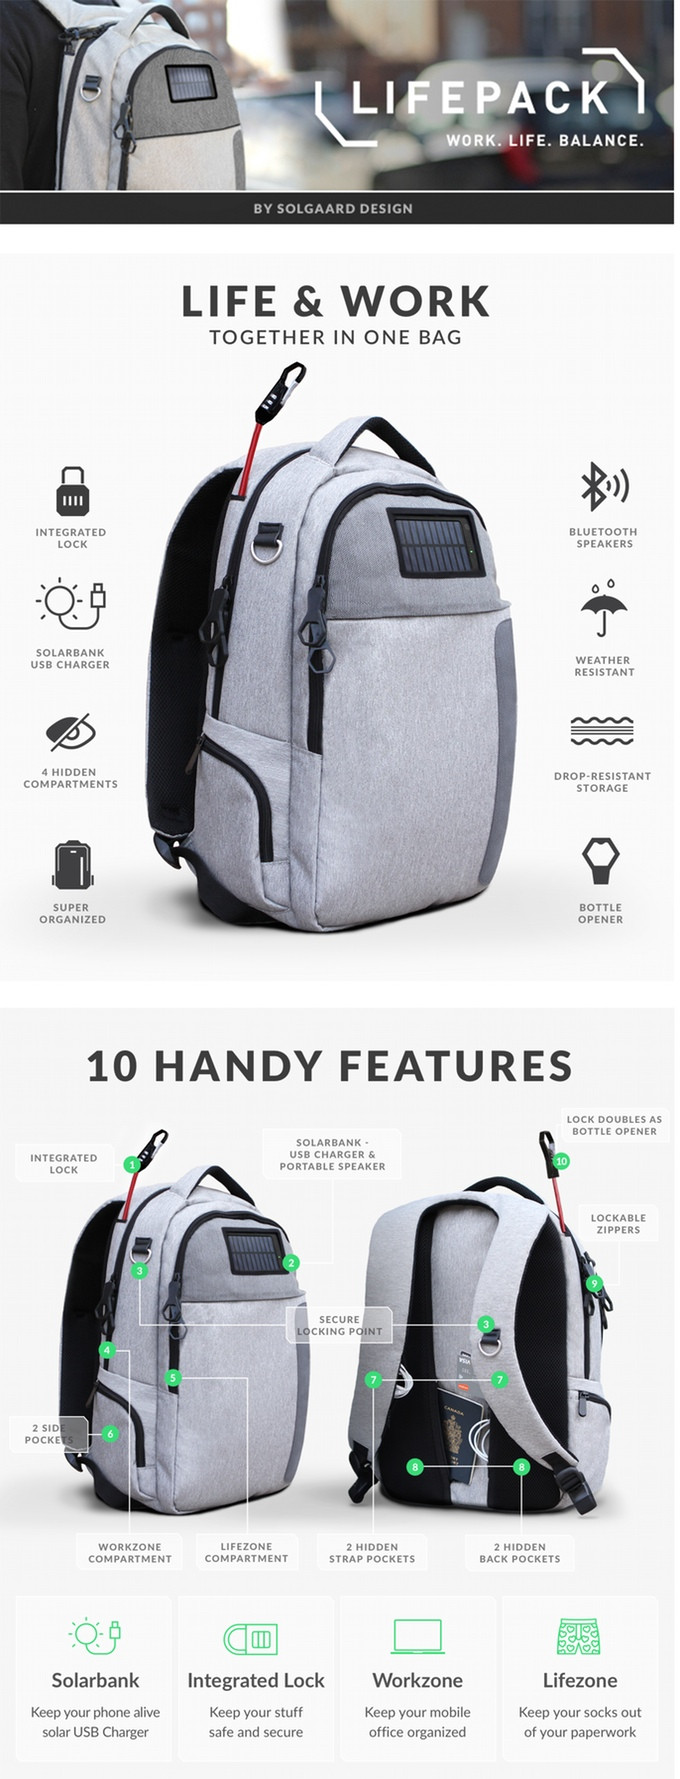 lifepack antithefz backpack